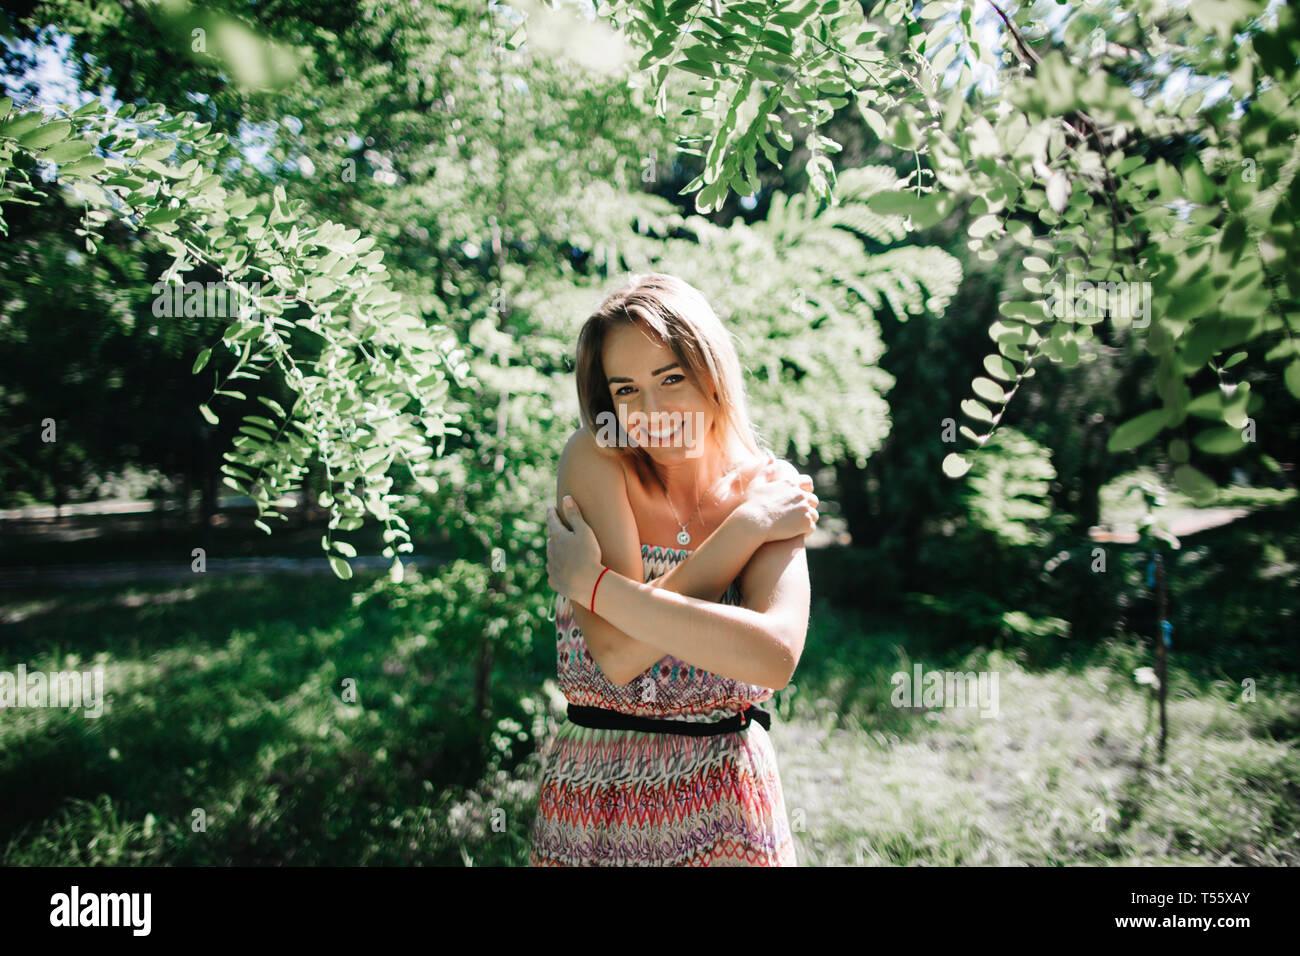 Junge Frau lächelnd in park Stockfoto